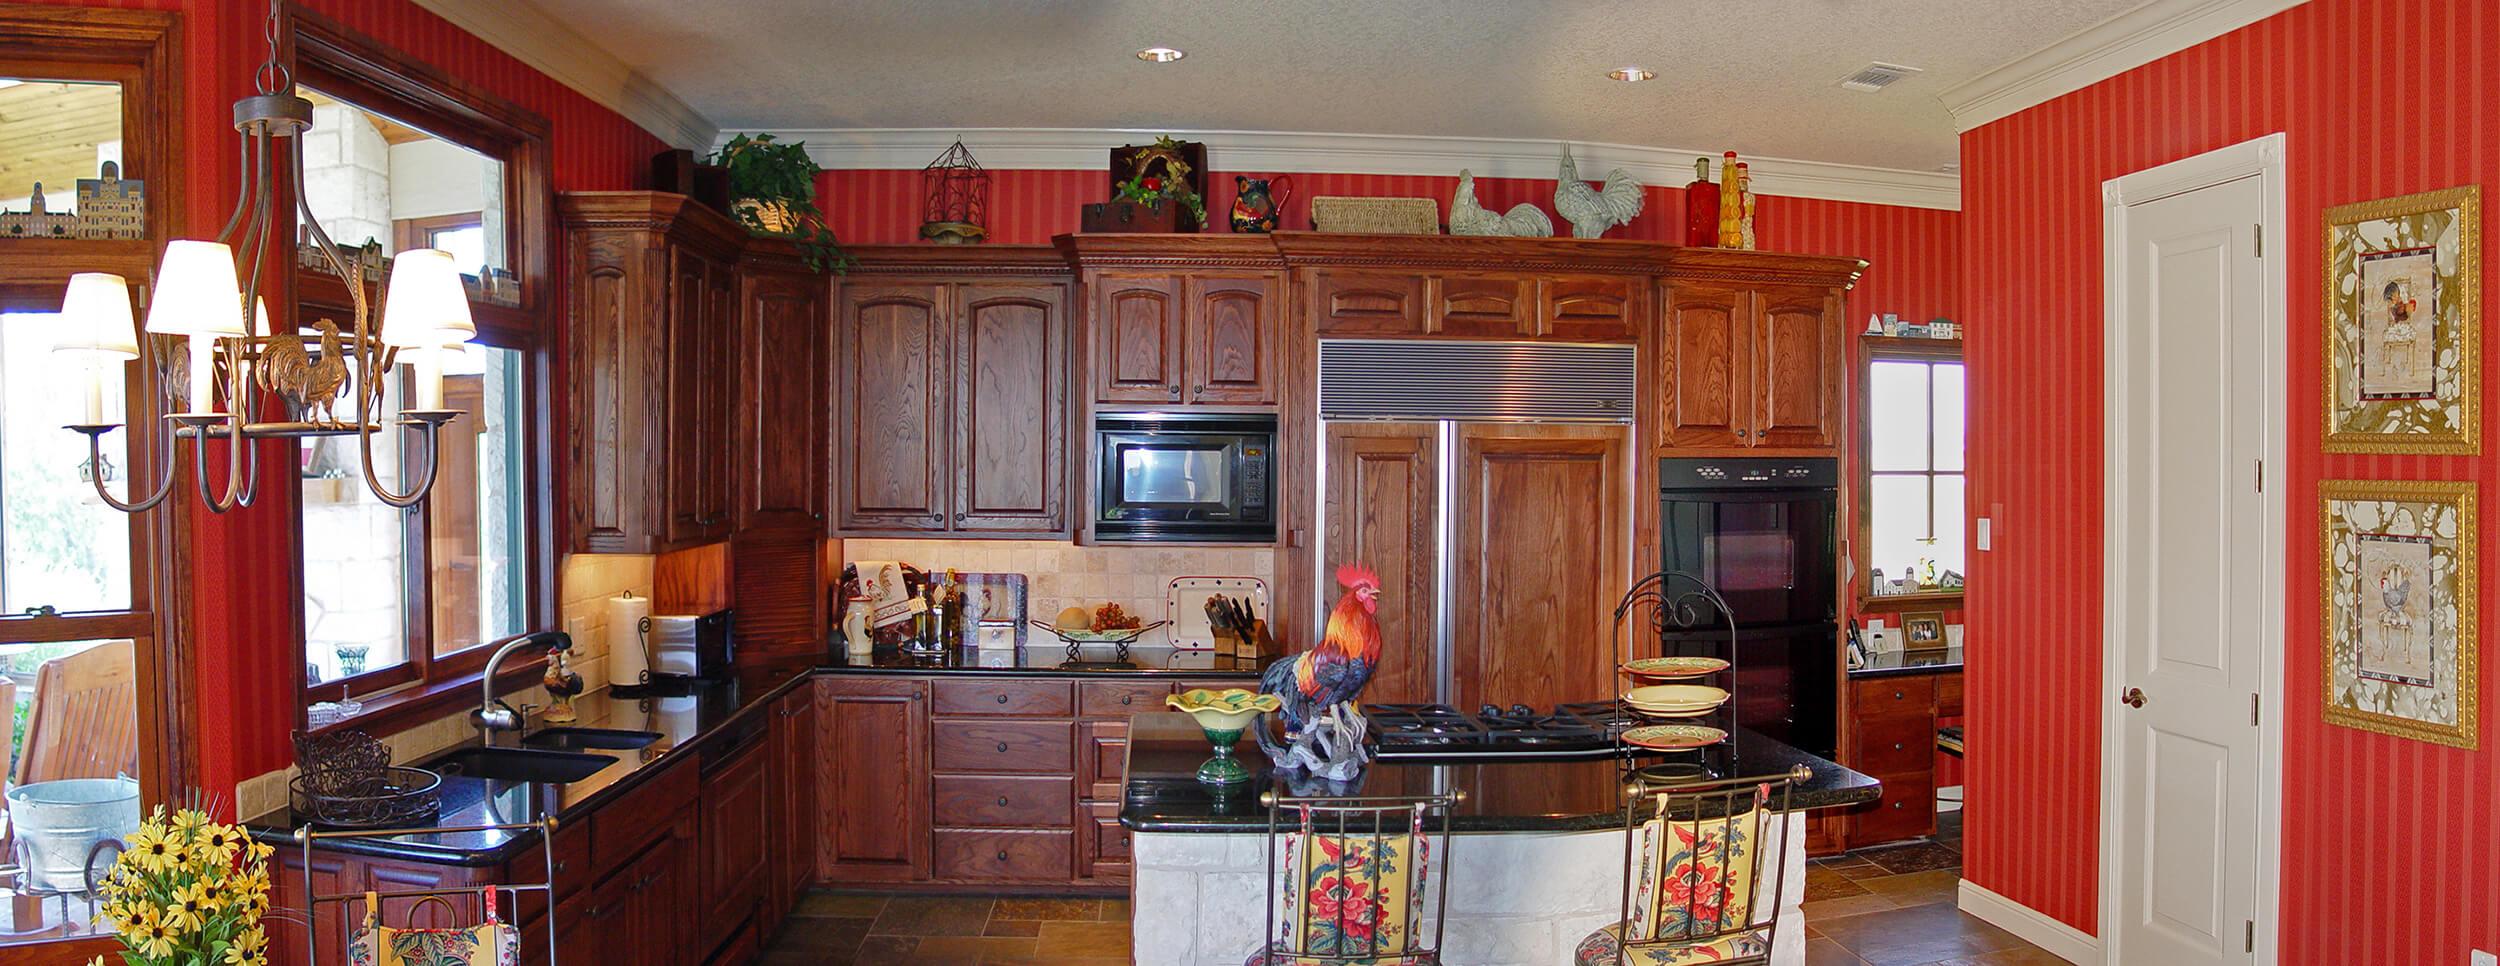 Steve_Bumpas_Custom_Homes_Granbury_Cotton_06.jpg